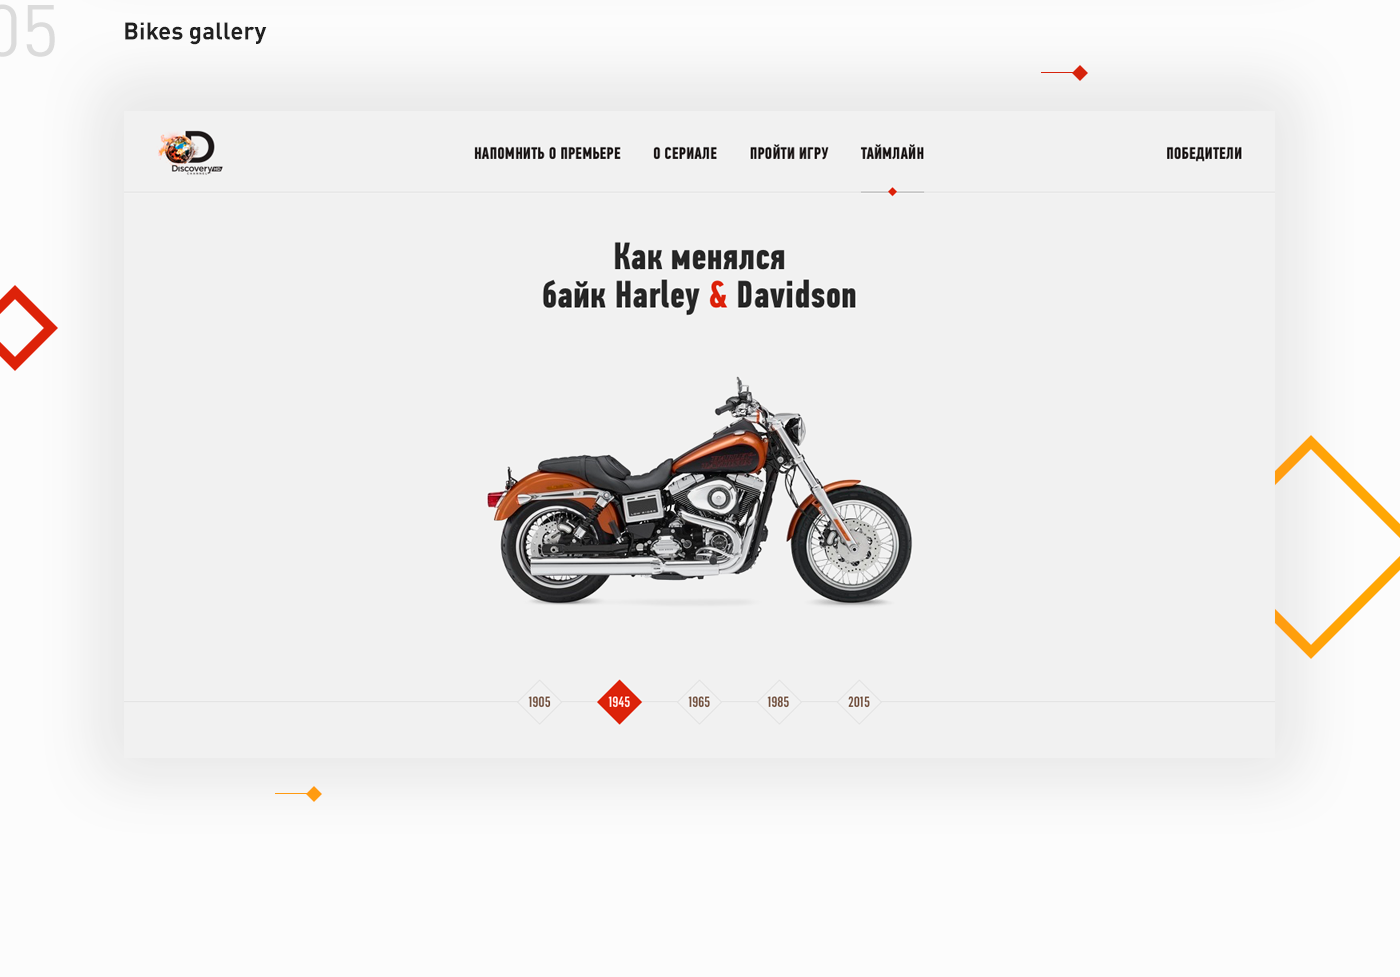 discovery Channel films harley Davidson Web site design ux UI